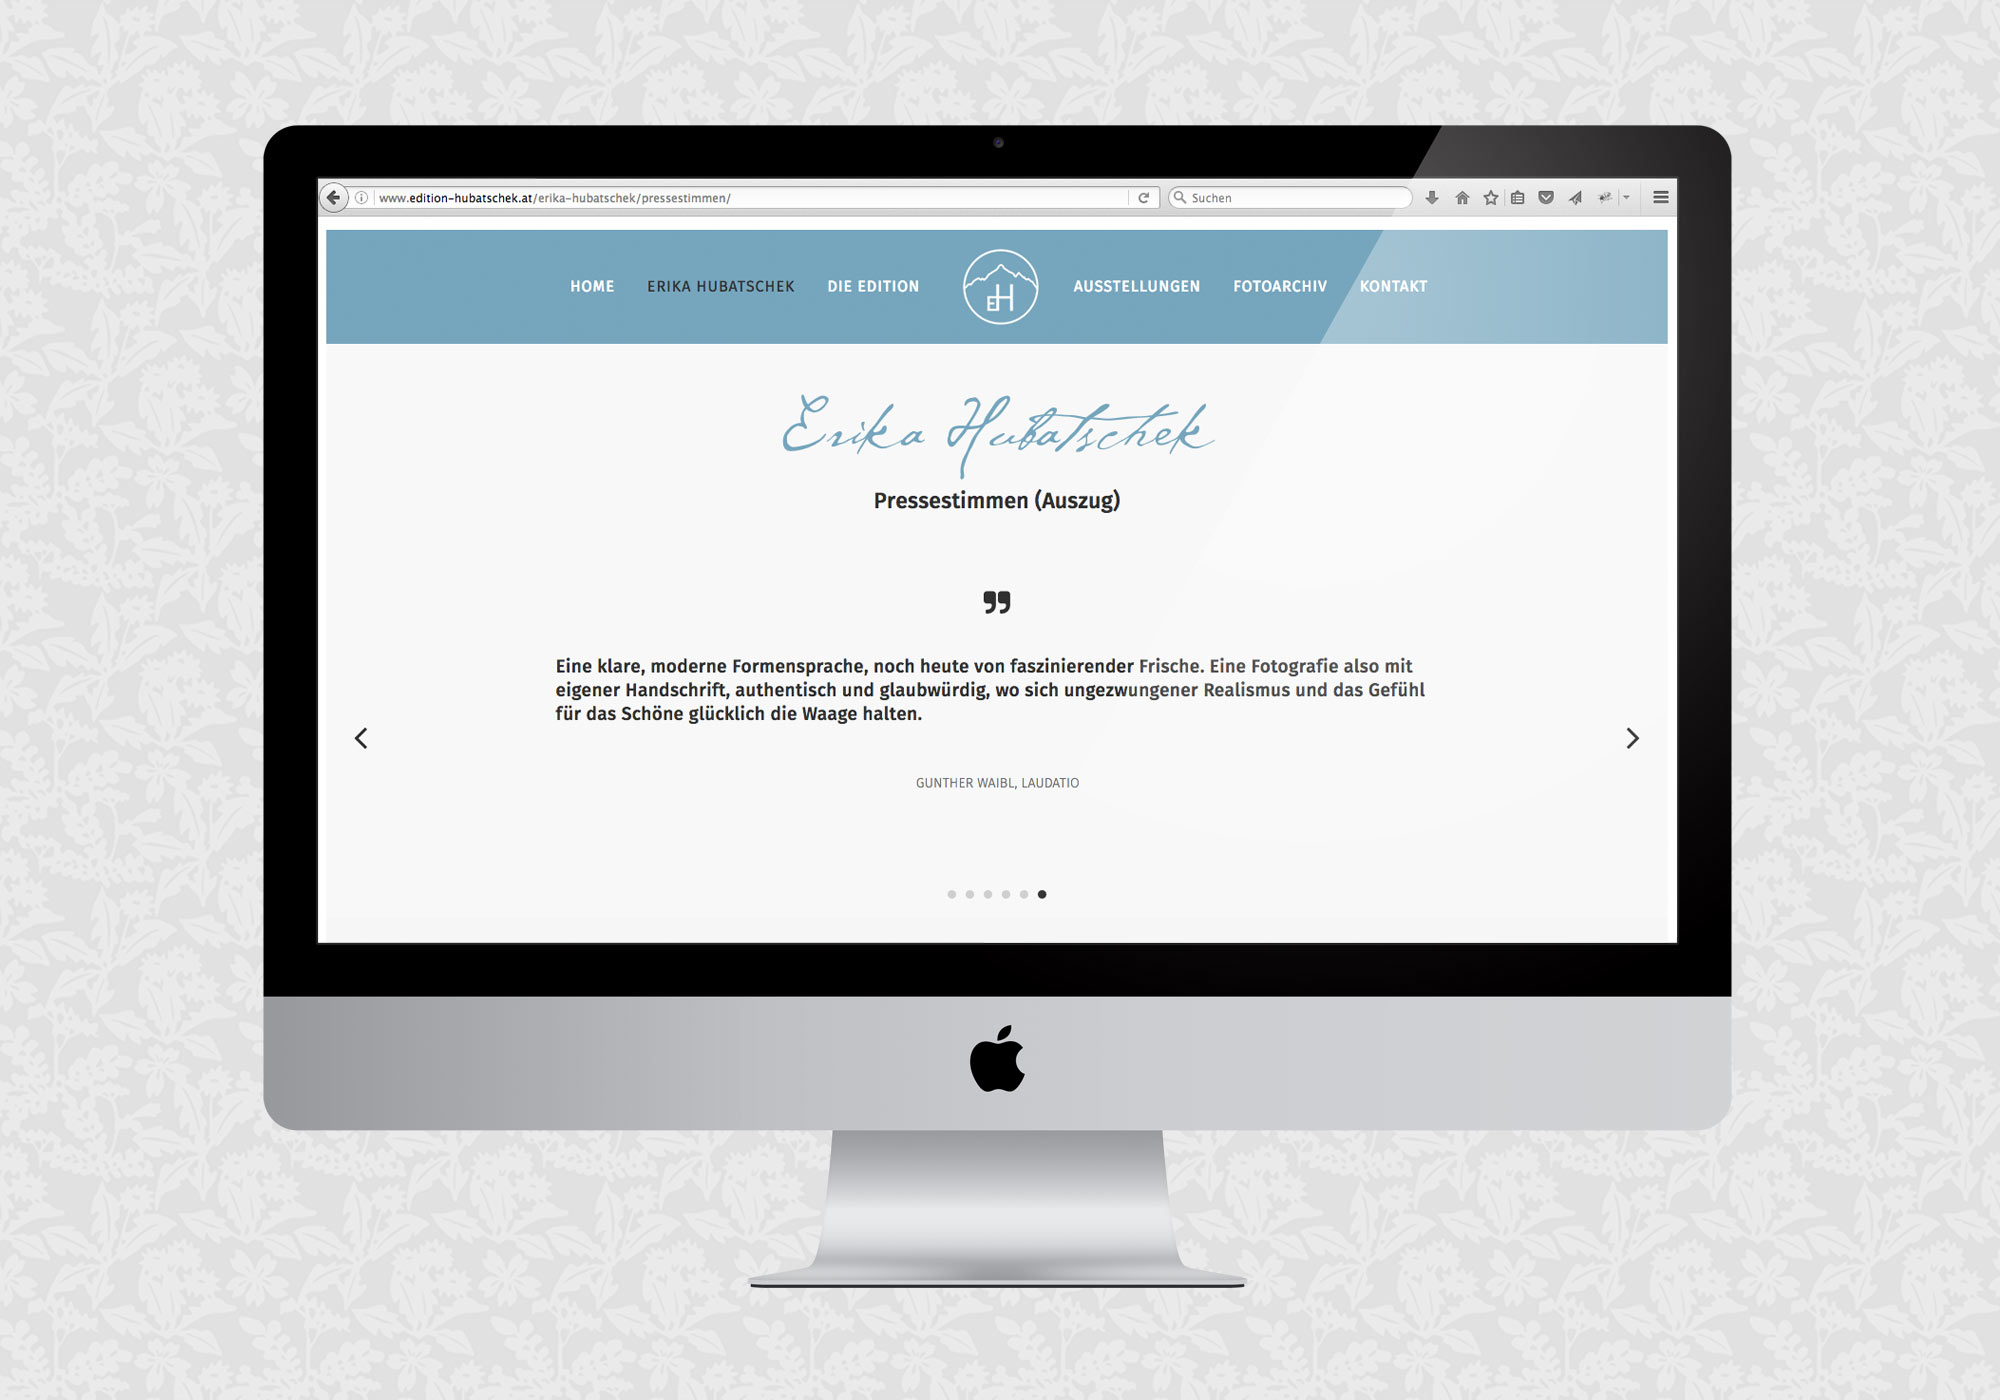 Website Edition Hubatschek